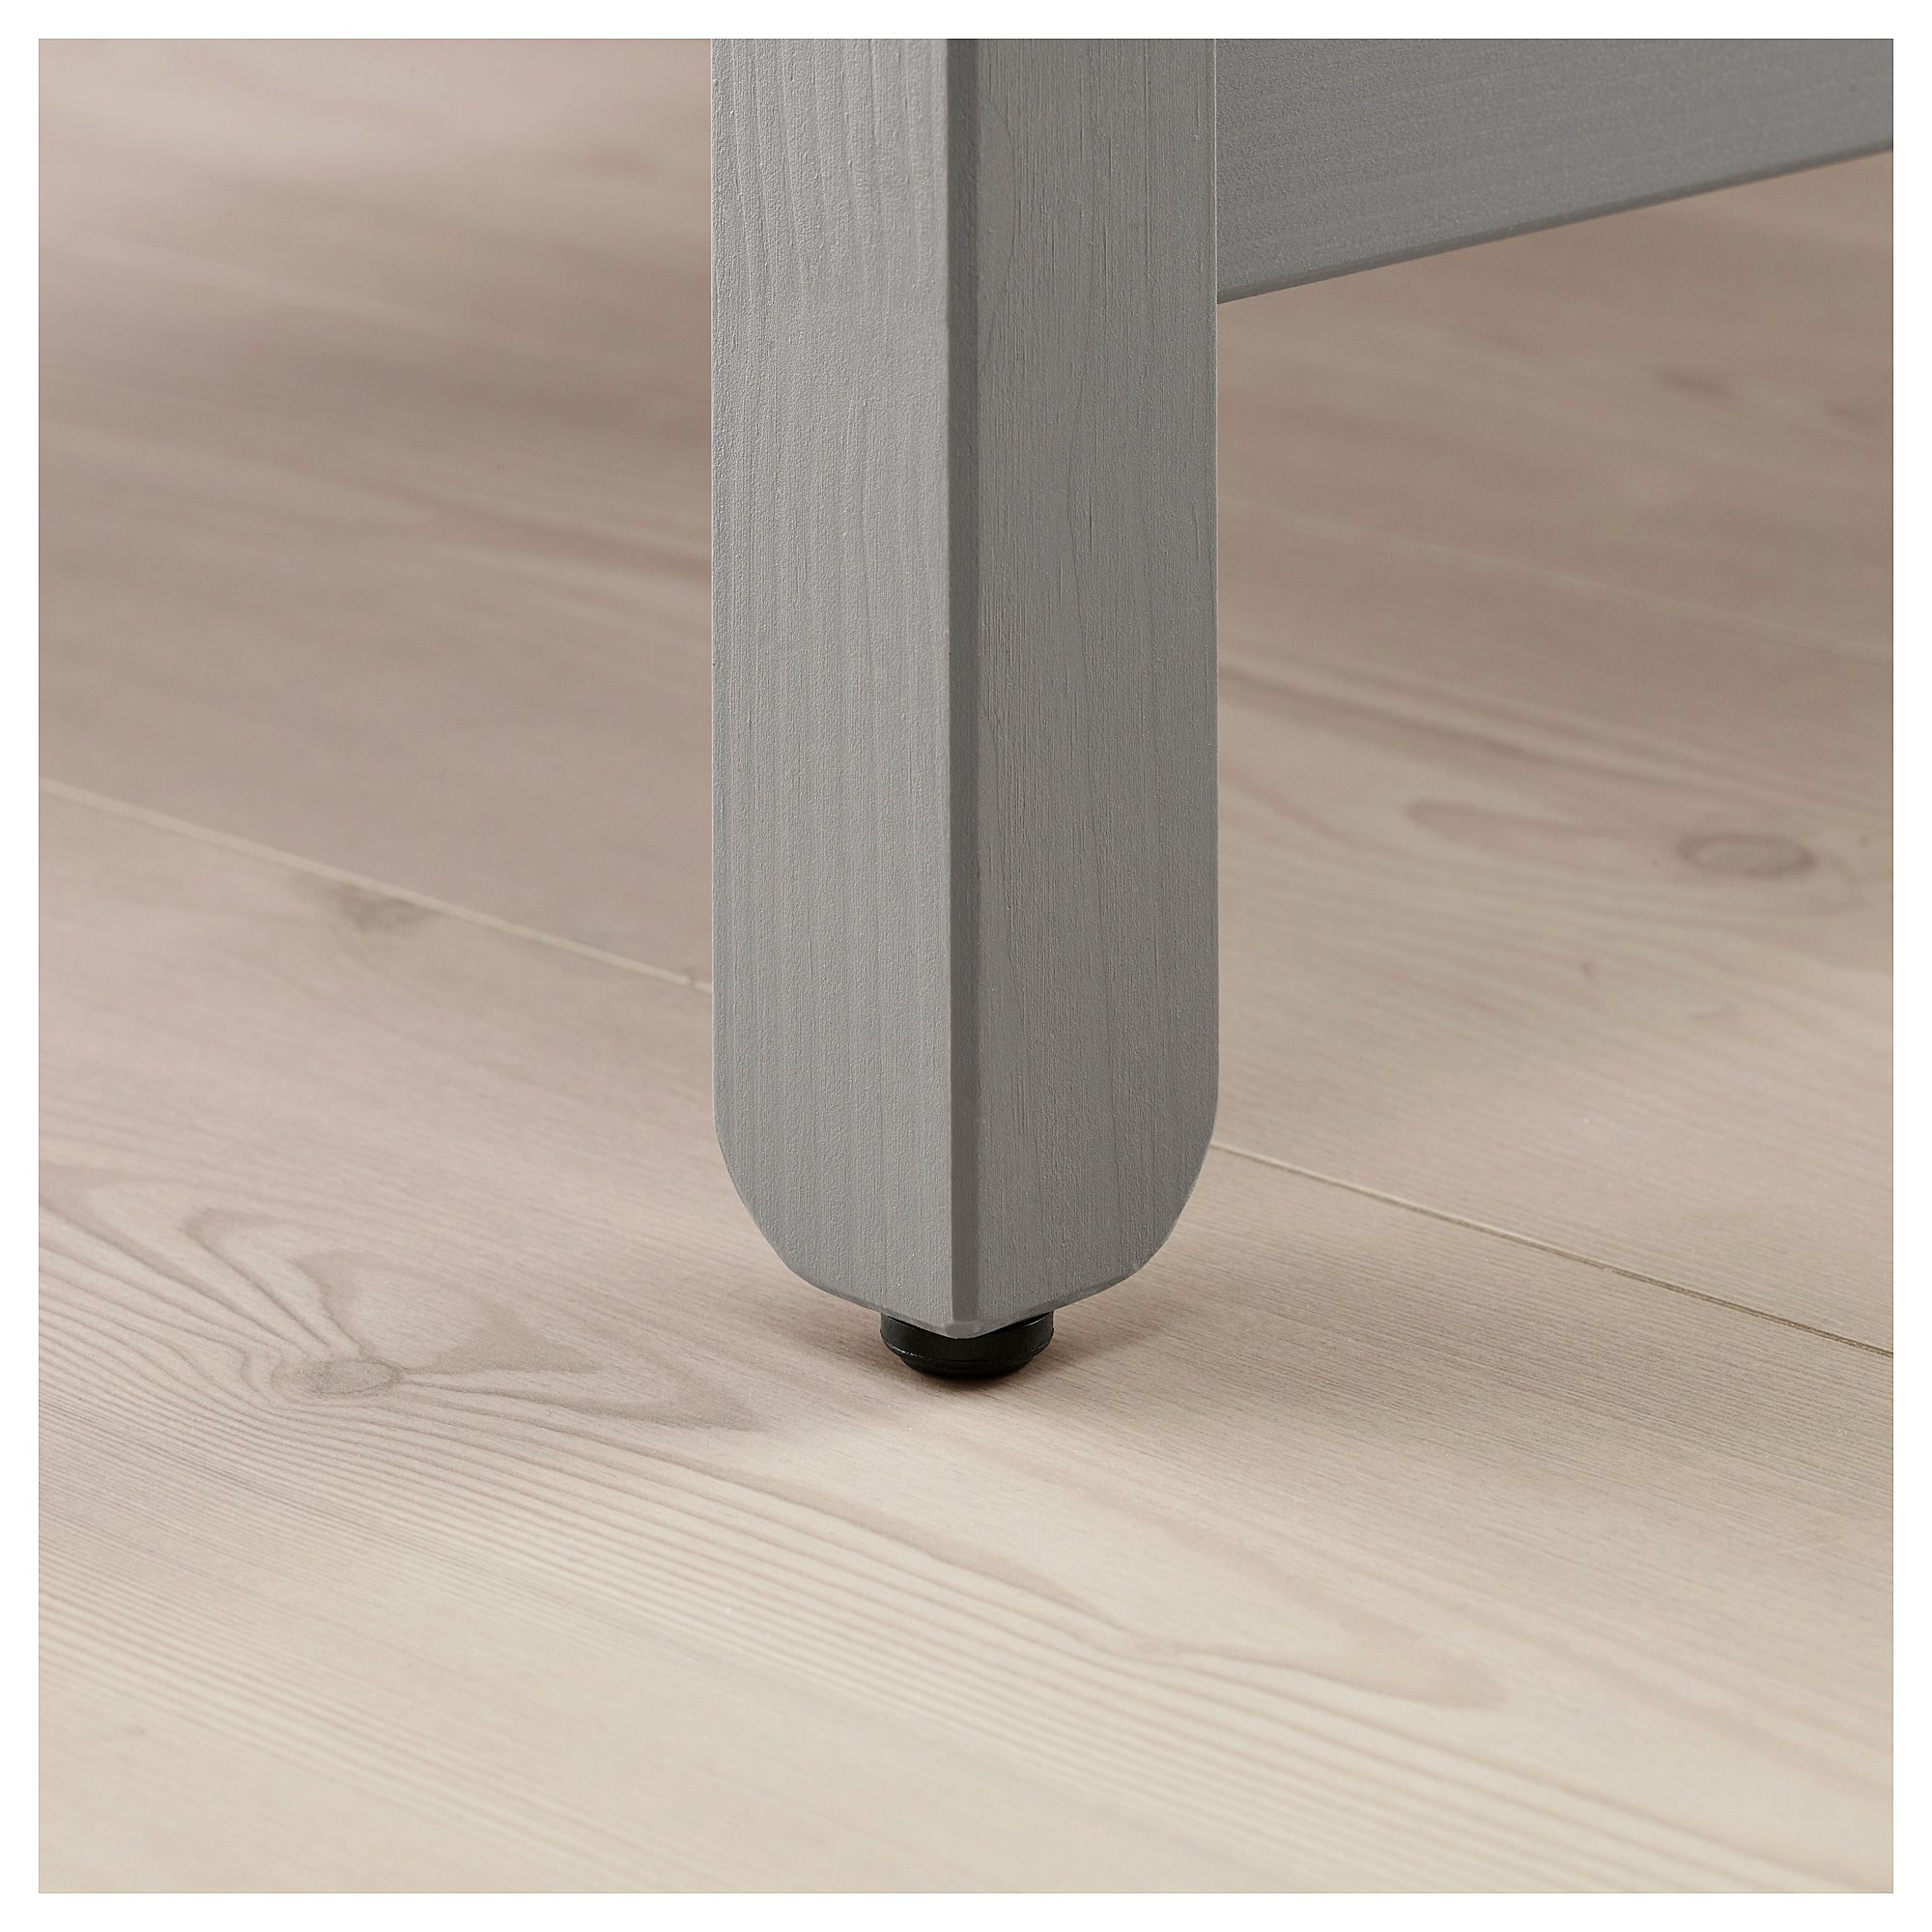 Ikea Havsta Console Table Gray